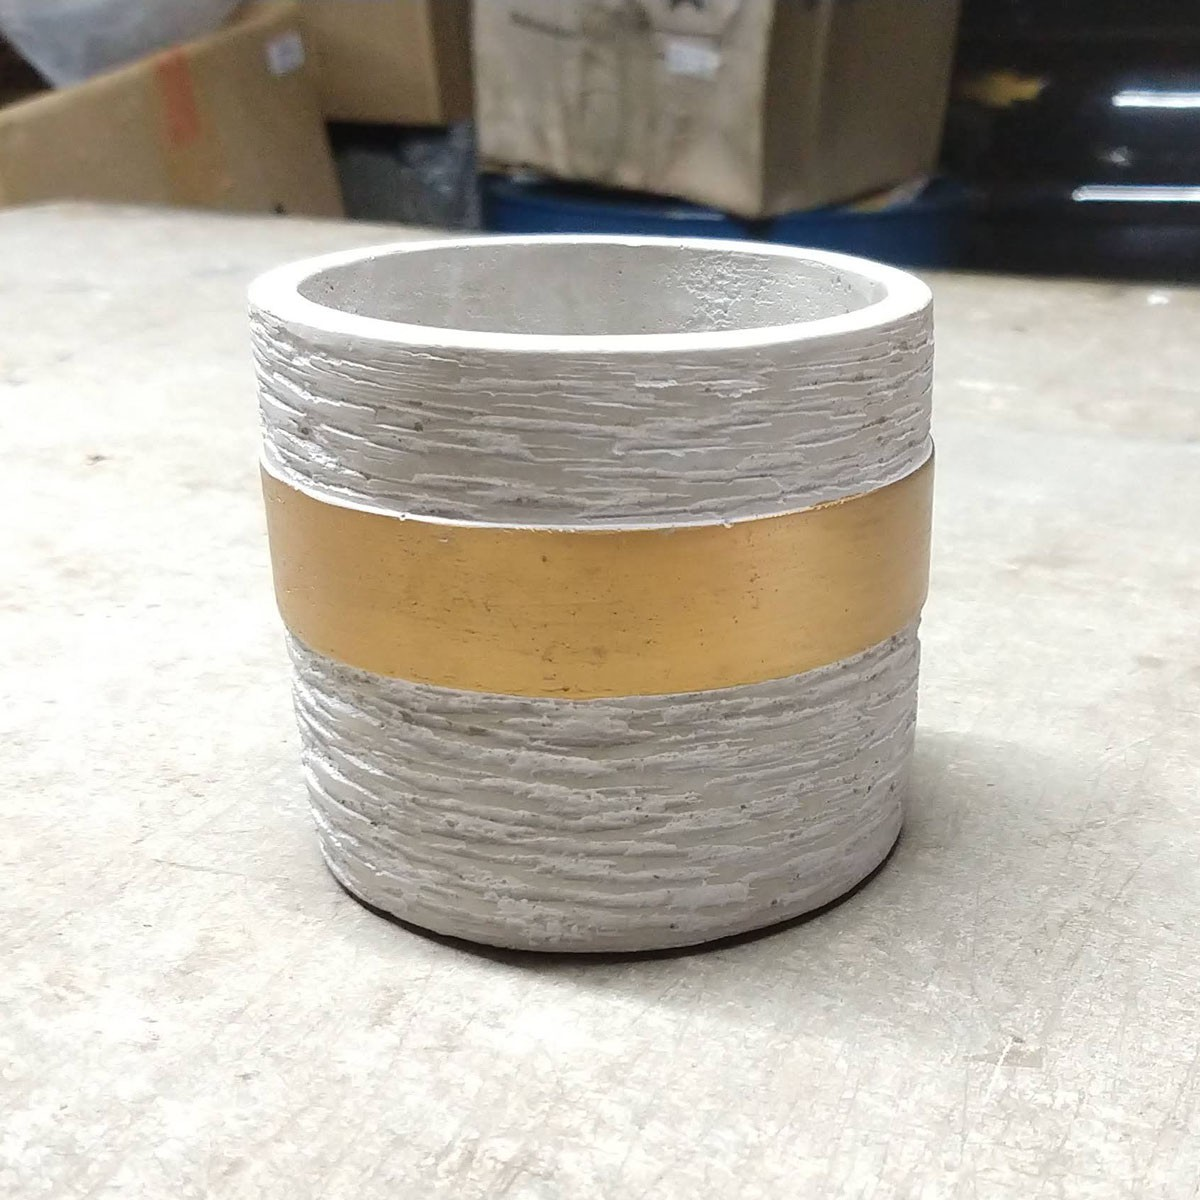 Cachepot de Cimento Texturizado Dourado